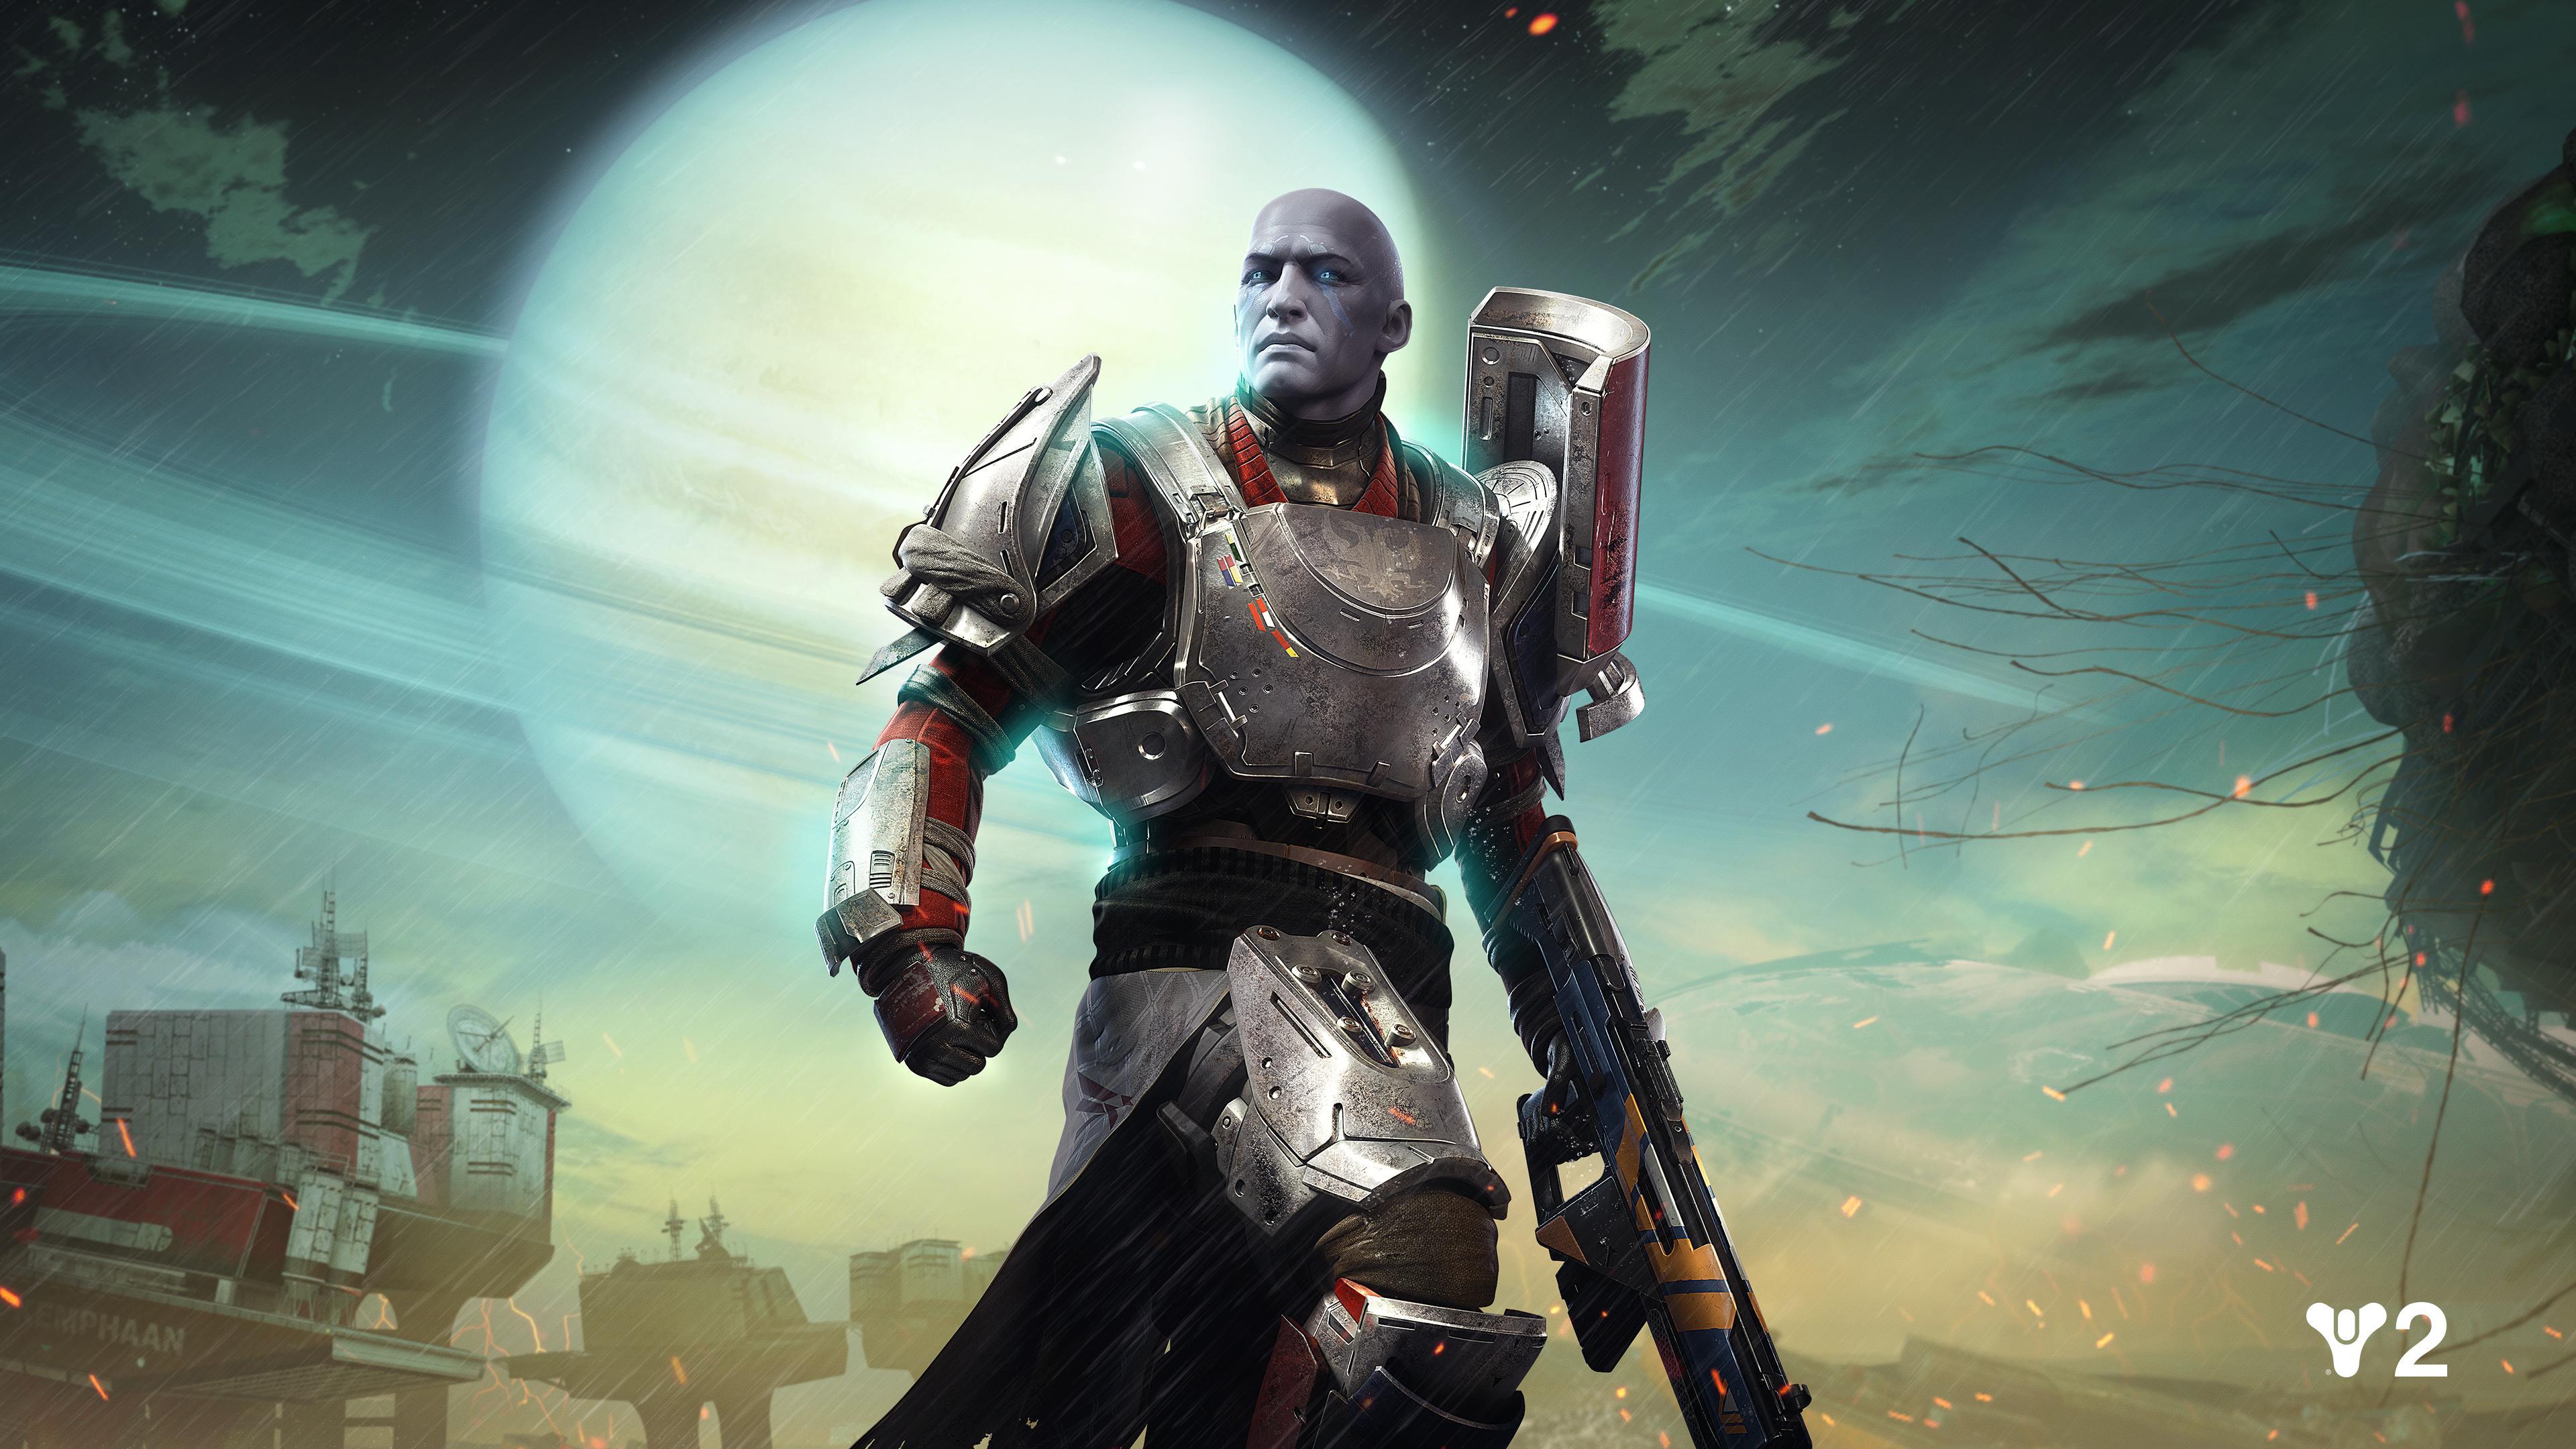 destiny 2 video game hd wallpaper 61909